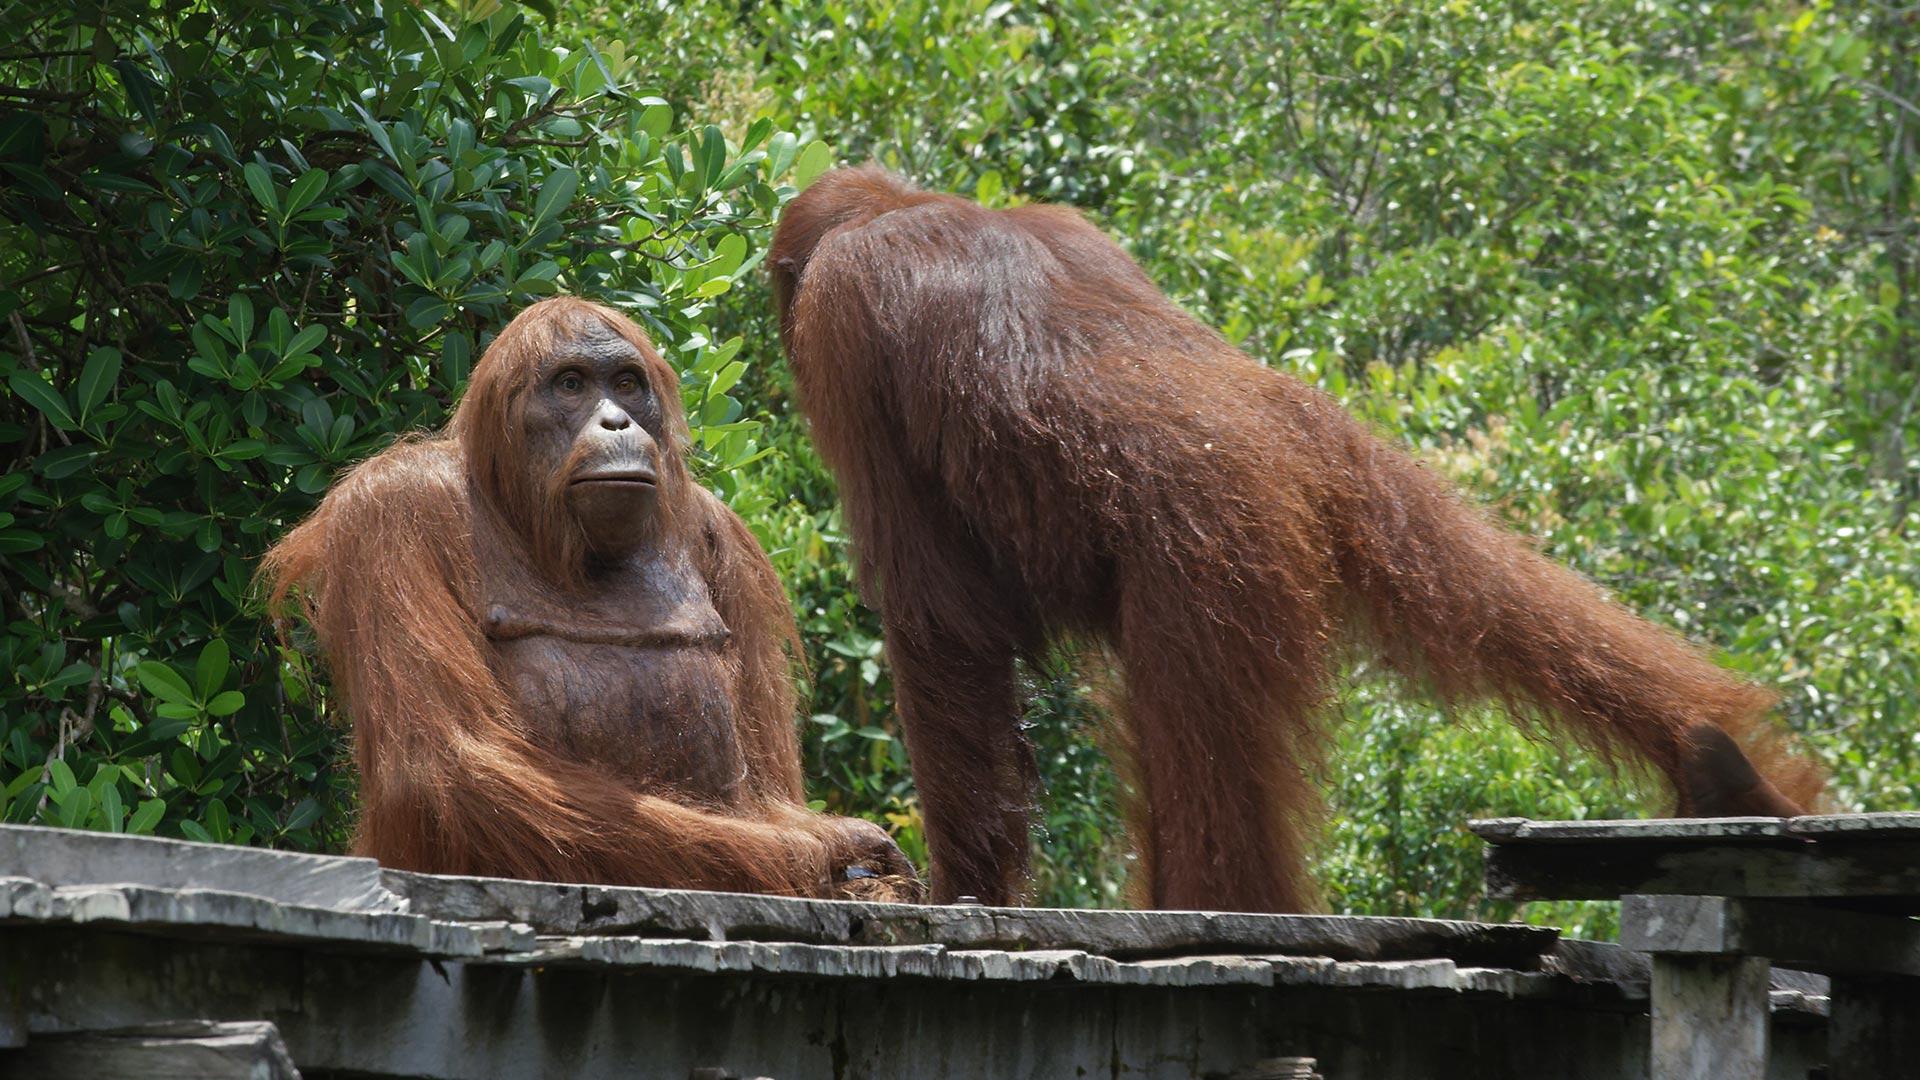 Orangutan inspecting Spy Orangutan. Borneo.